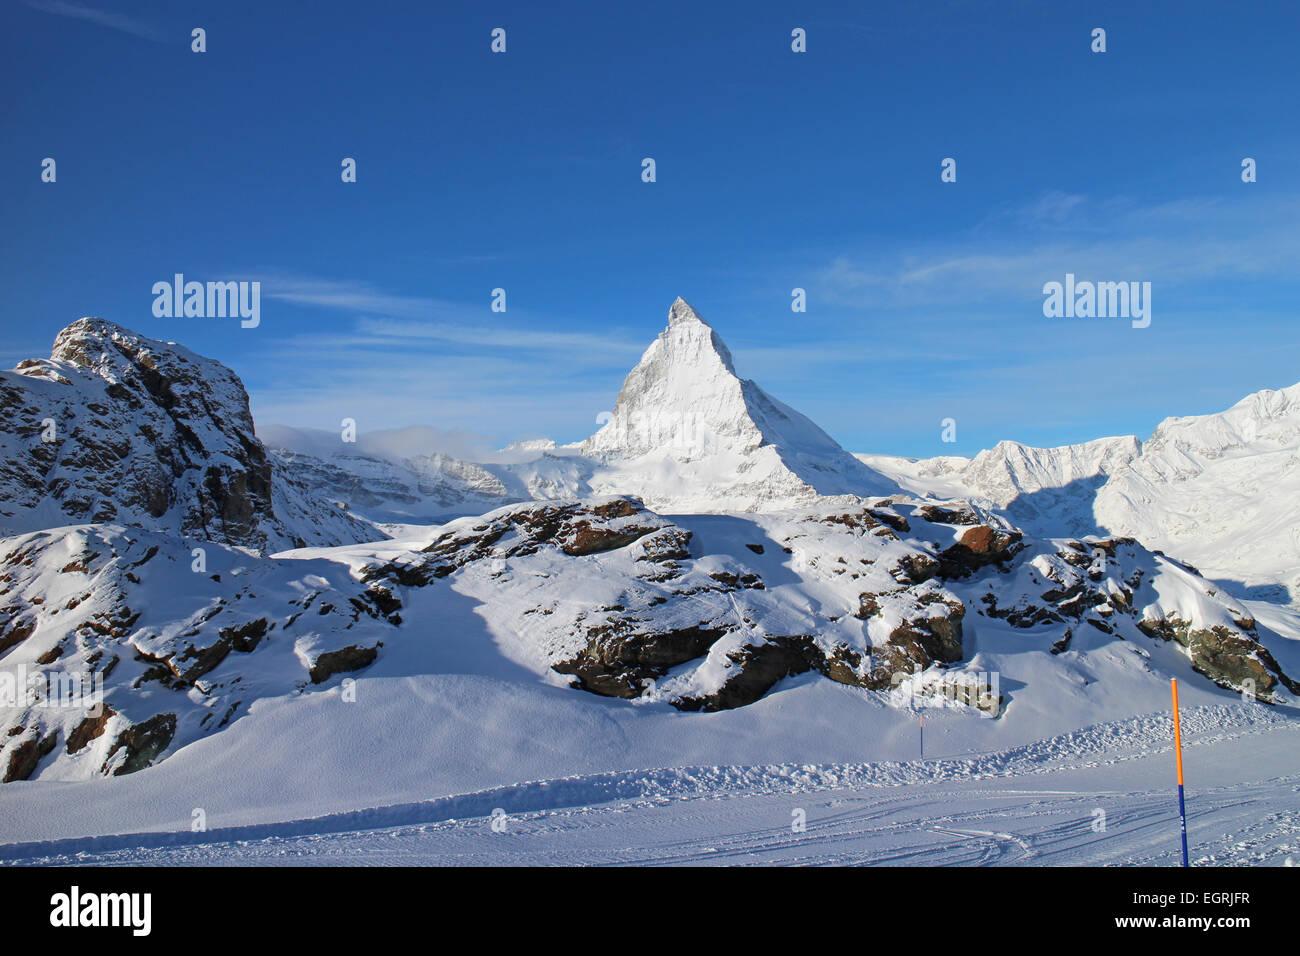 Matterhorn, Zermatt, Switzerland from Rotenboden - Stock Image